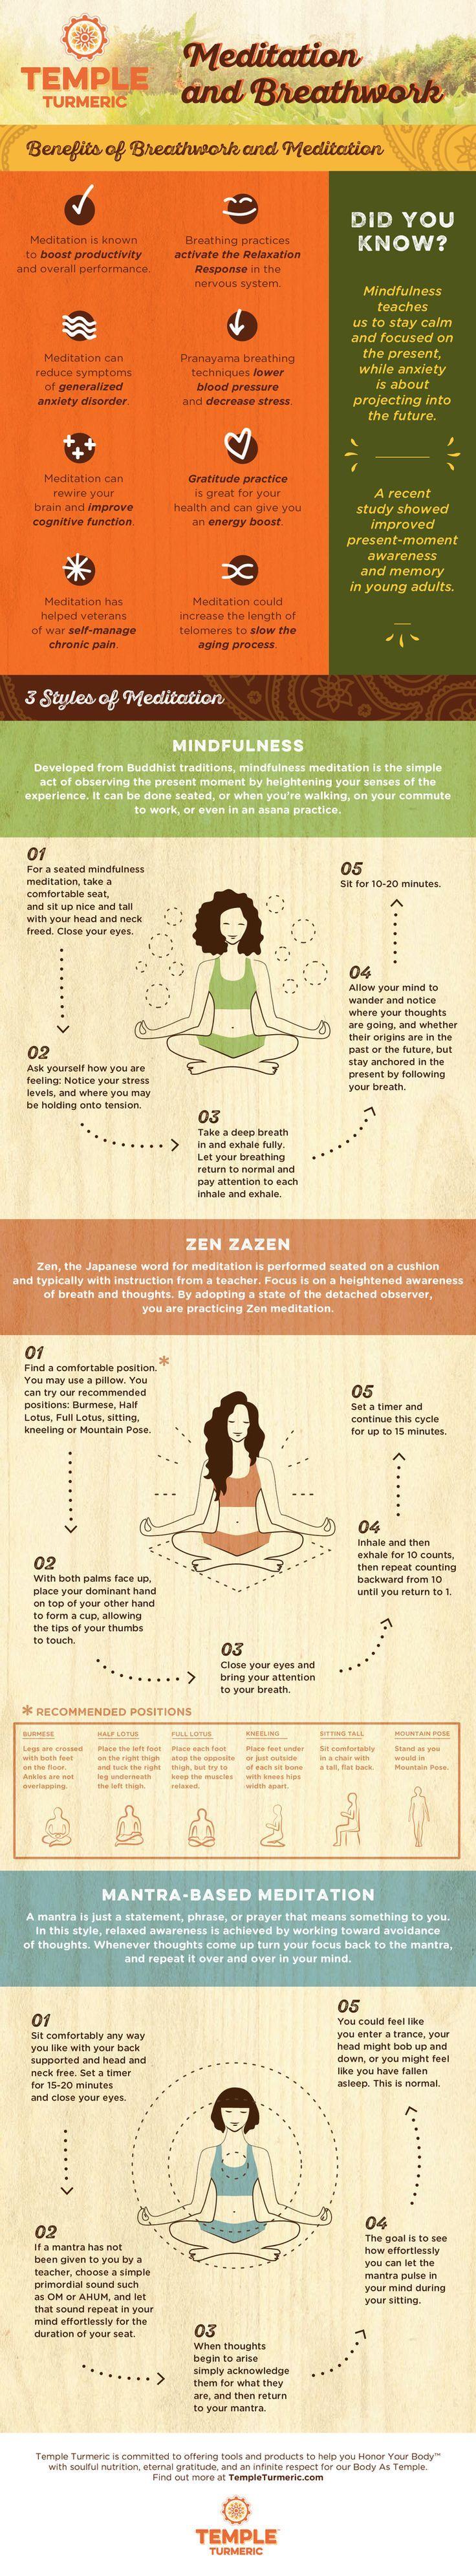 INFOGRAPHIC: 3 Meditation Practices Explained www.deviyogaforwomen.com: http://yoganonymous.com/infographic-3-meditation-practices-explained? #EssentialOils #Meditation Pinned for you by https://organicaromas.com